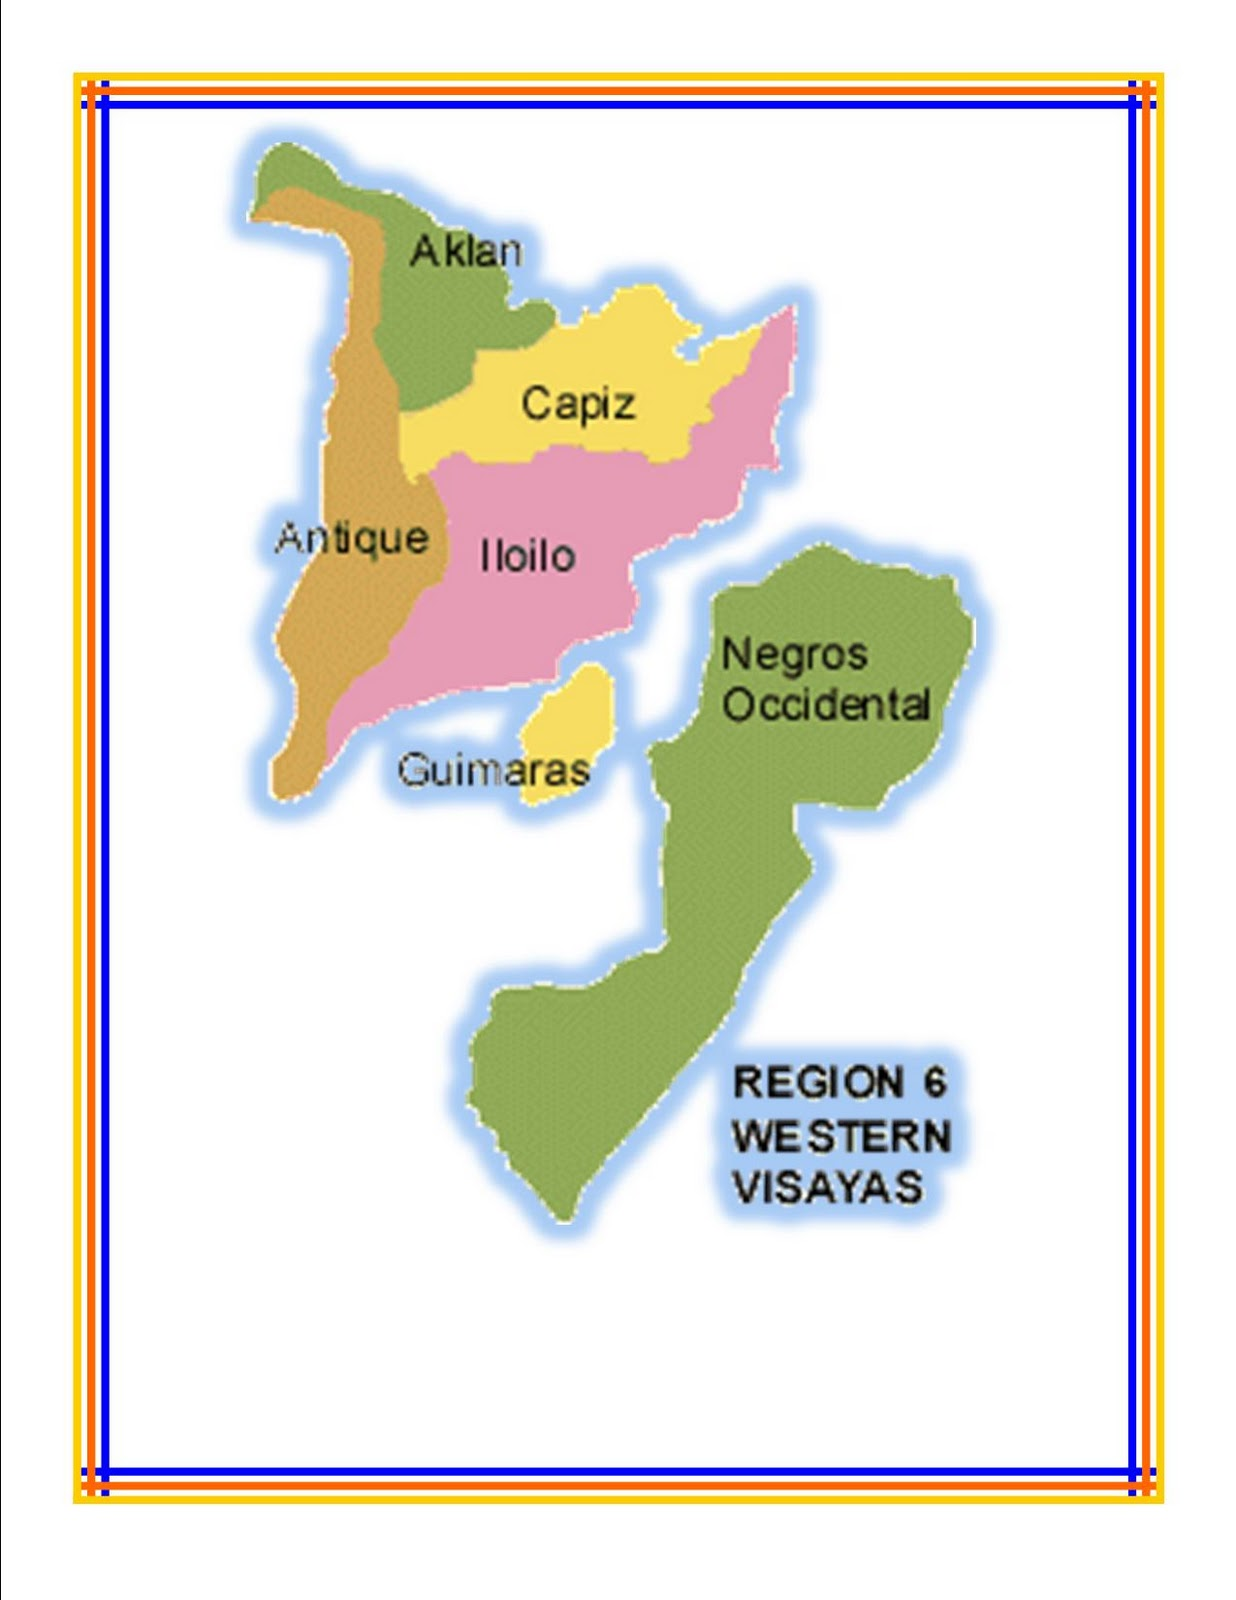 Mellec Computer Center Araling Pinoy Philippine Regions